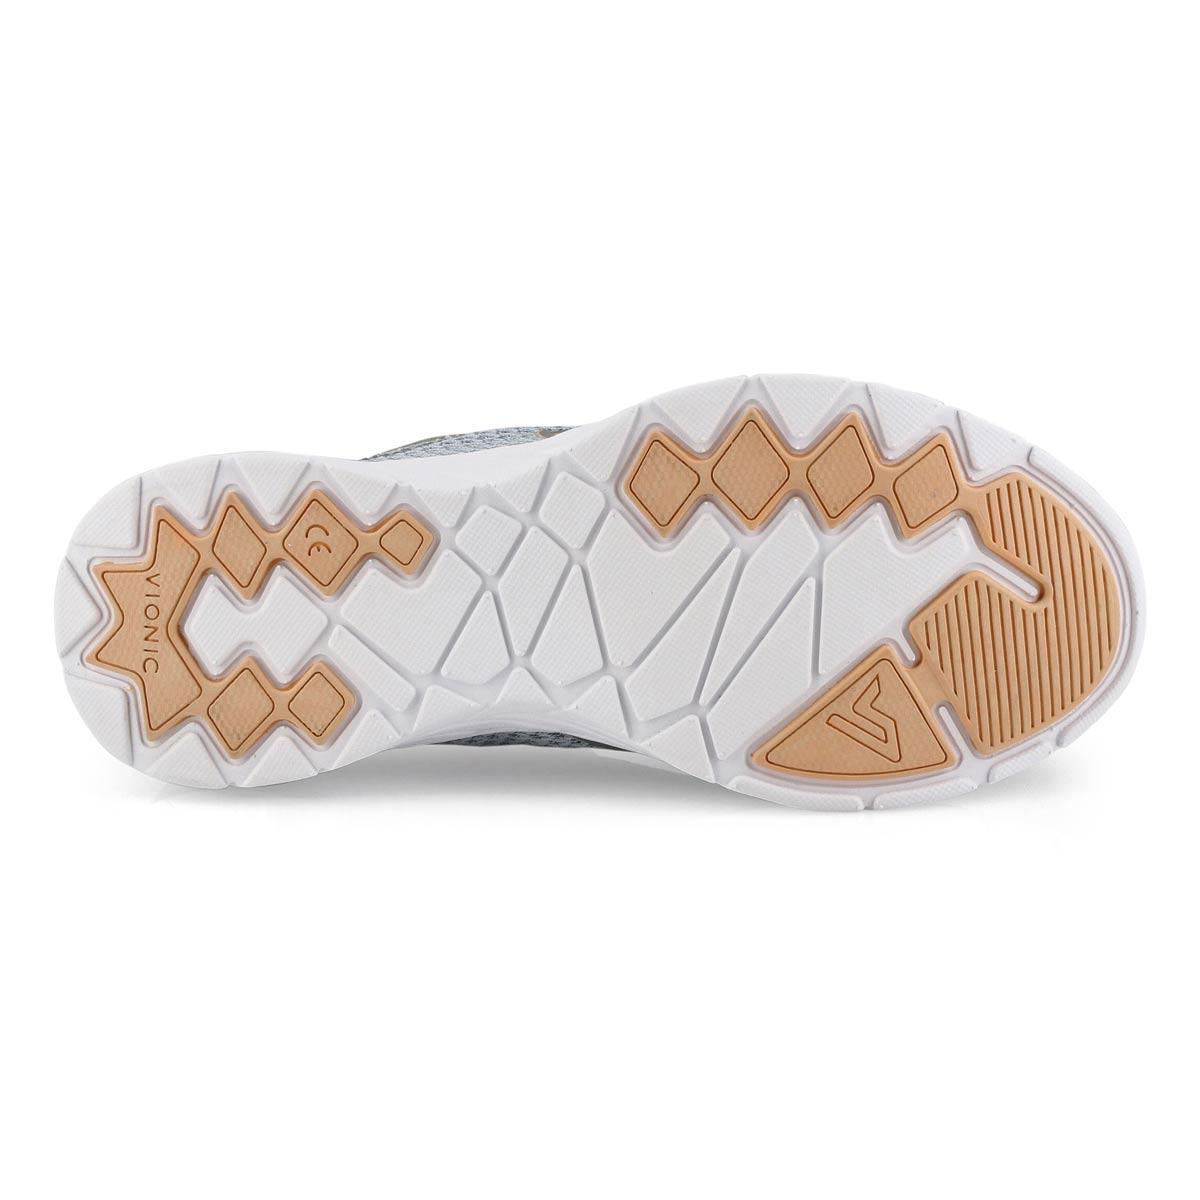 Lds Alma grey/blue lace up sneaker